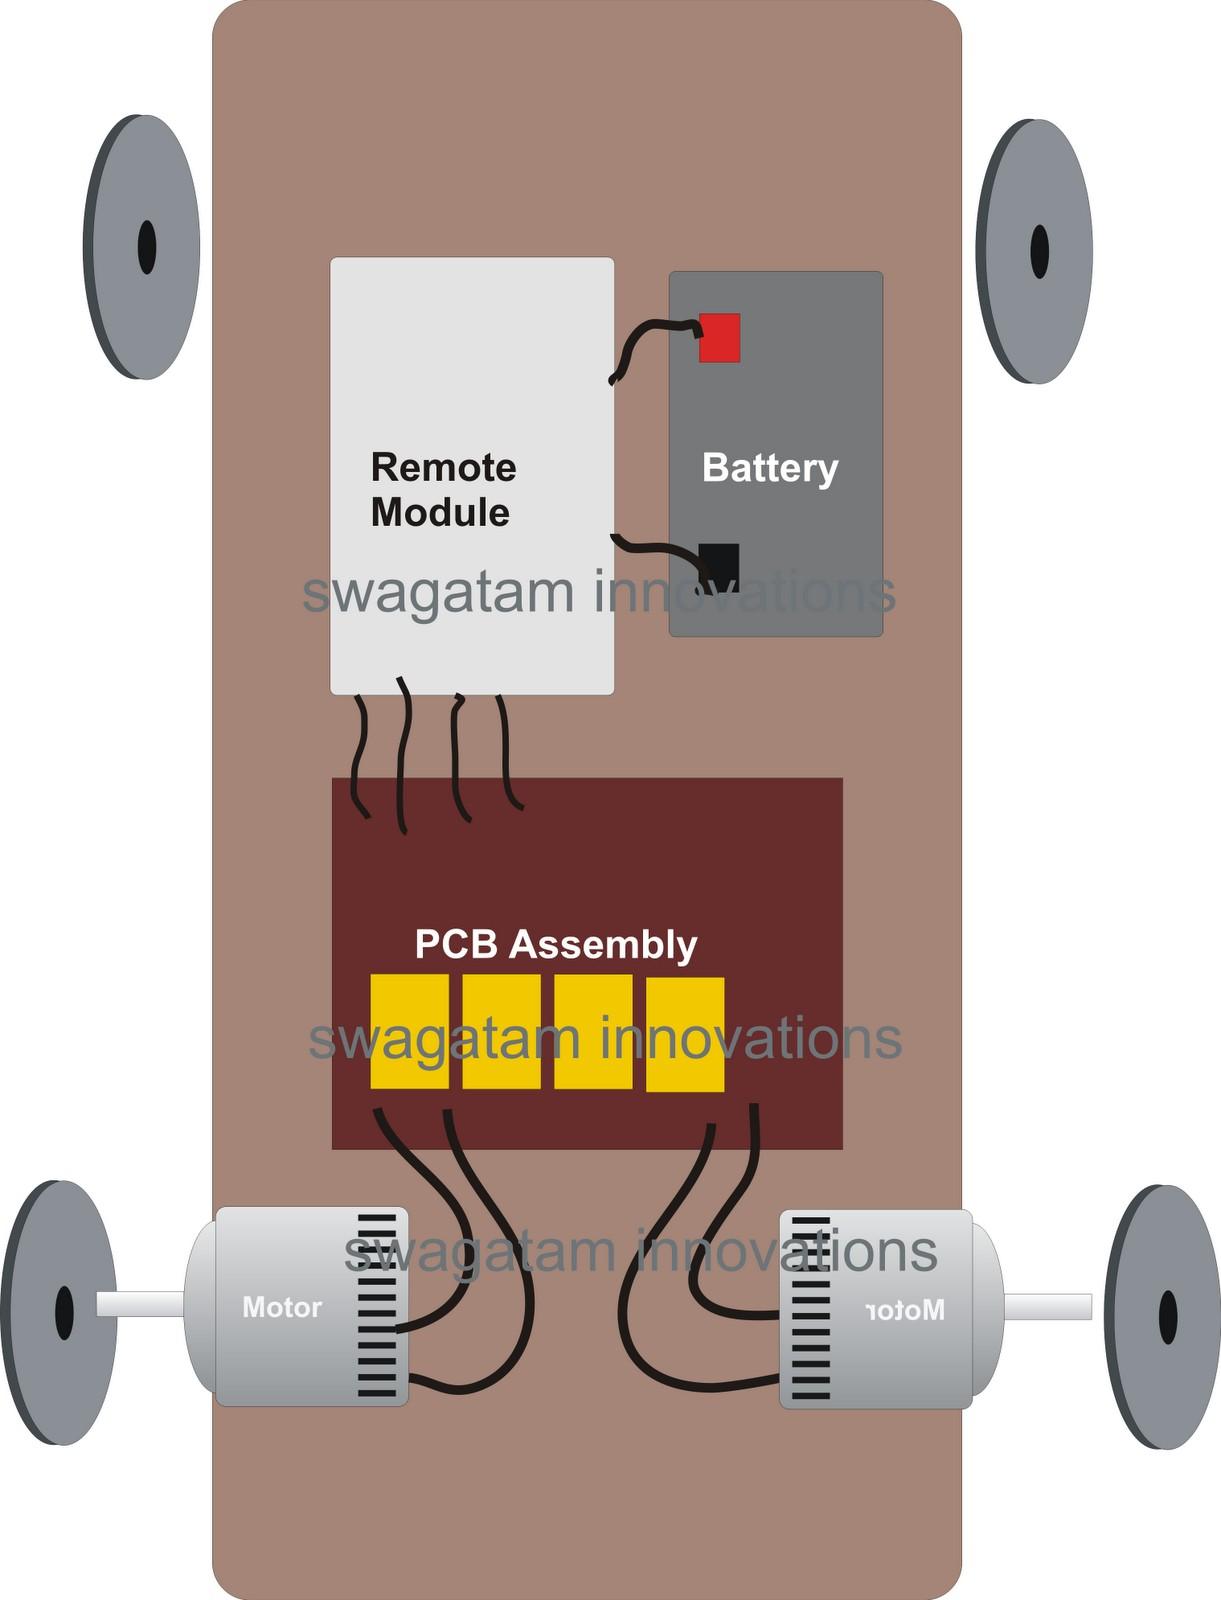 Electric Rc Car Diagram Car Diagram Electric Rc Car Wiring Diagramelectric Diagram Make Of Electric Rc Car Diagram